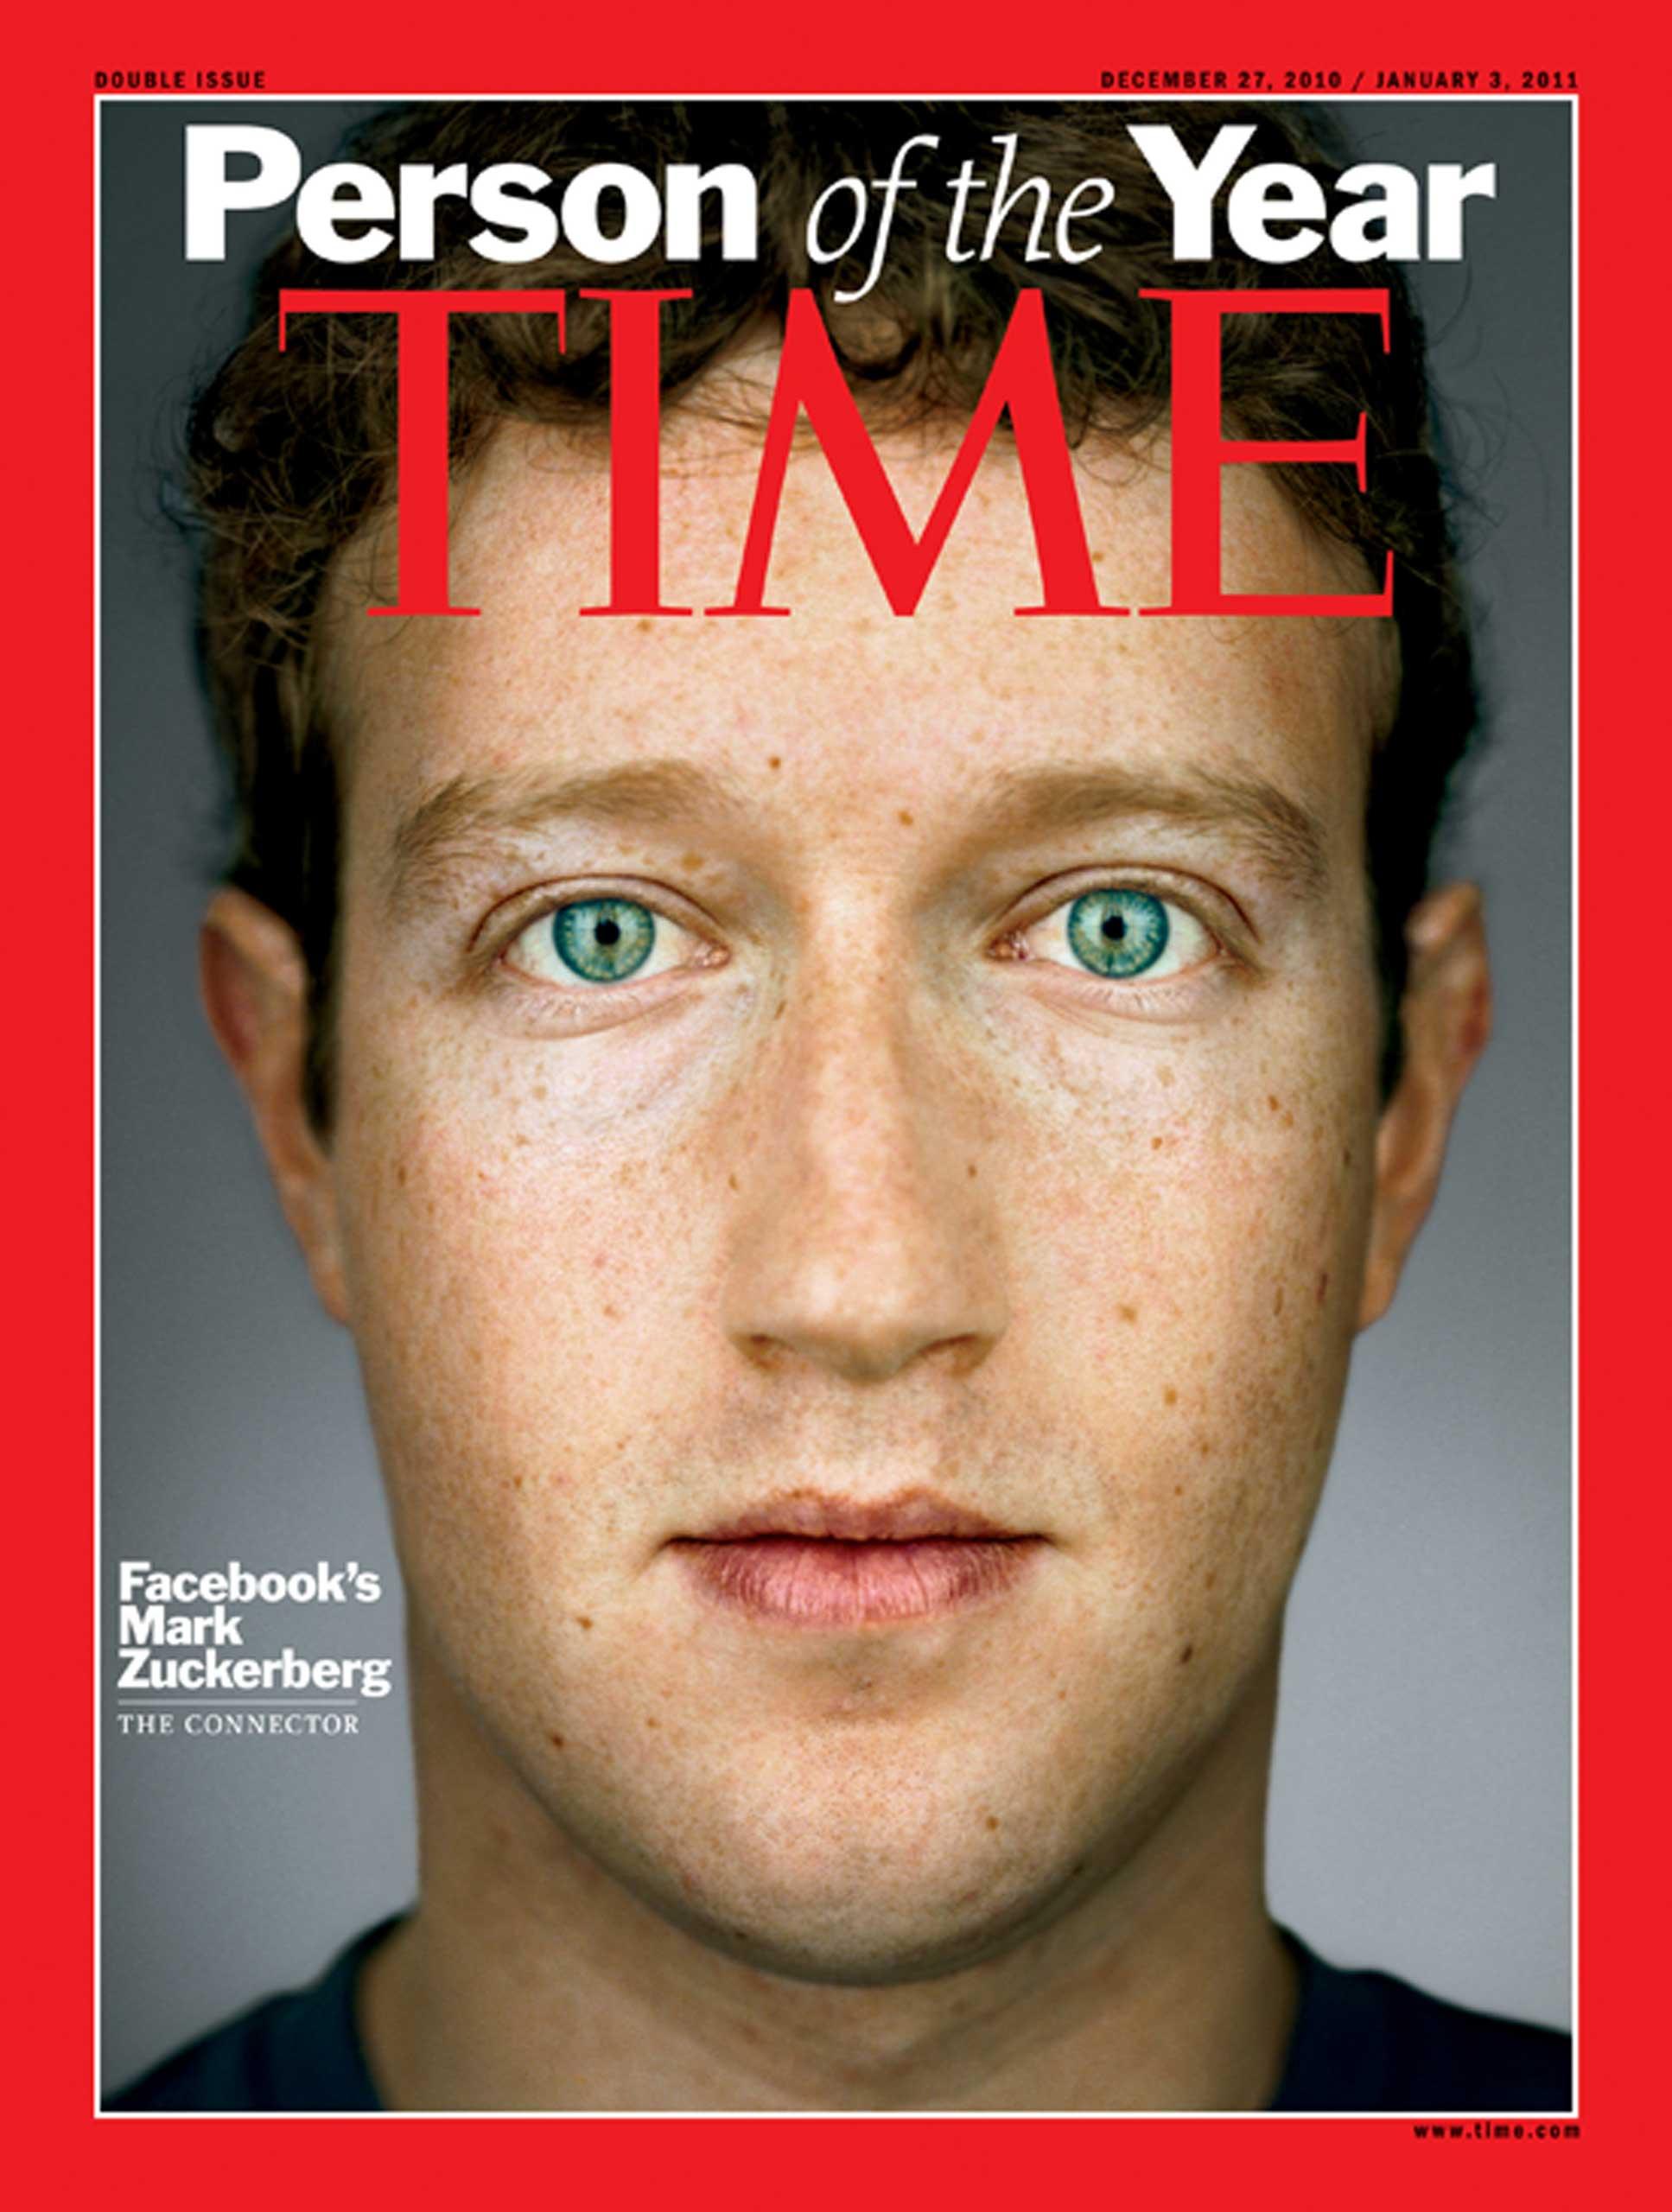 2010: Mark Zuckerberg